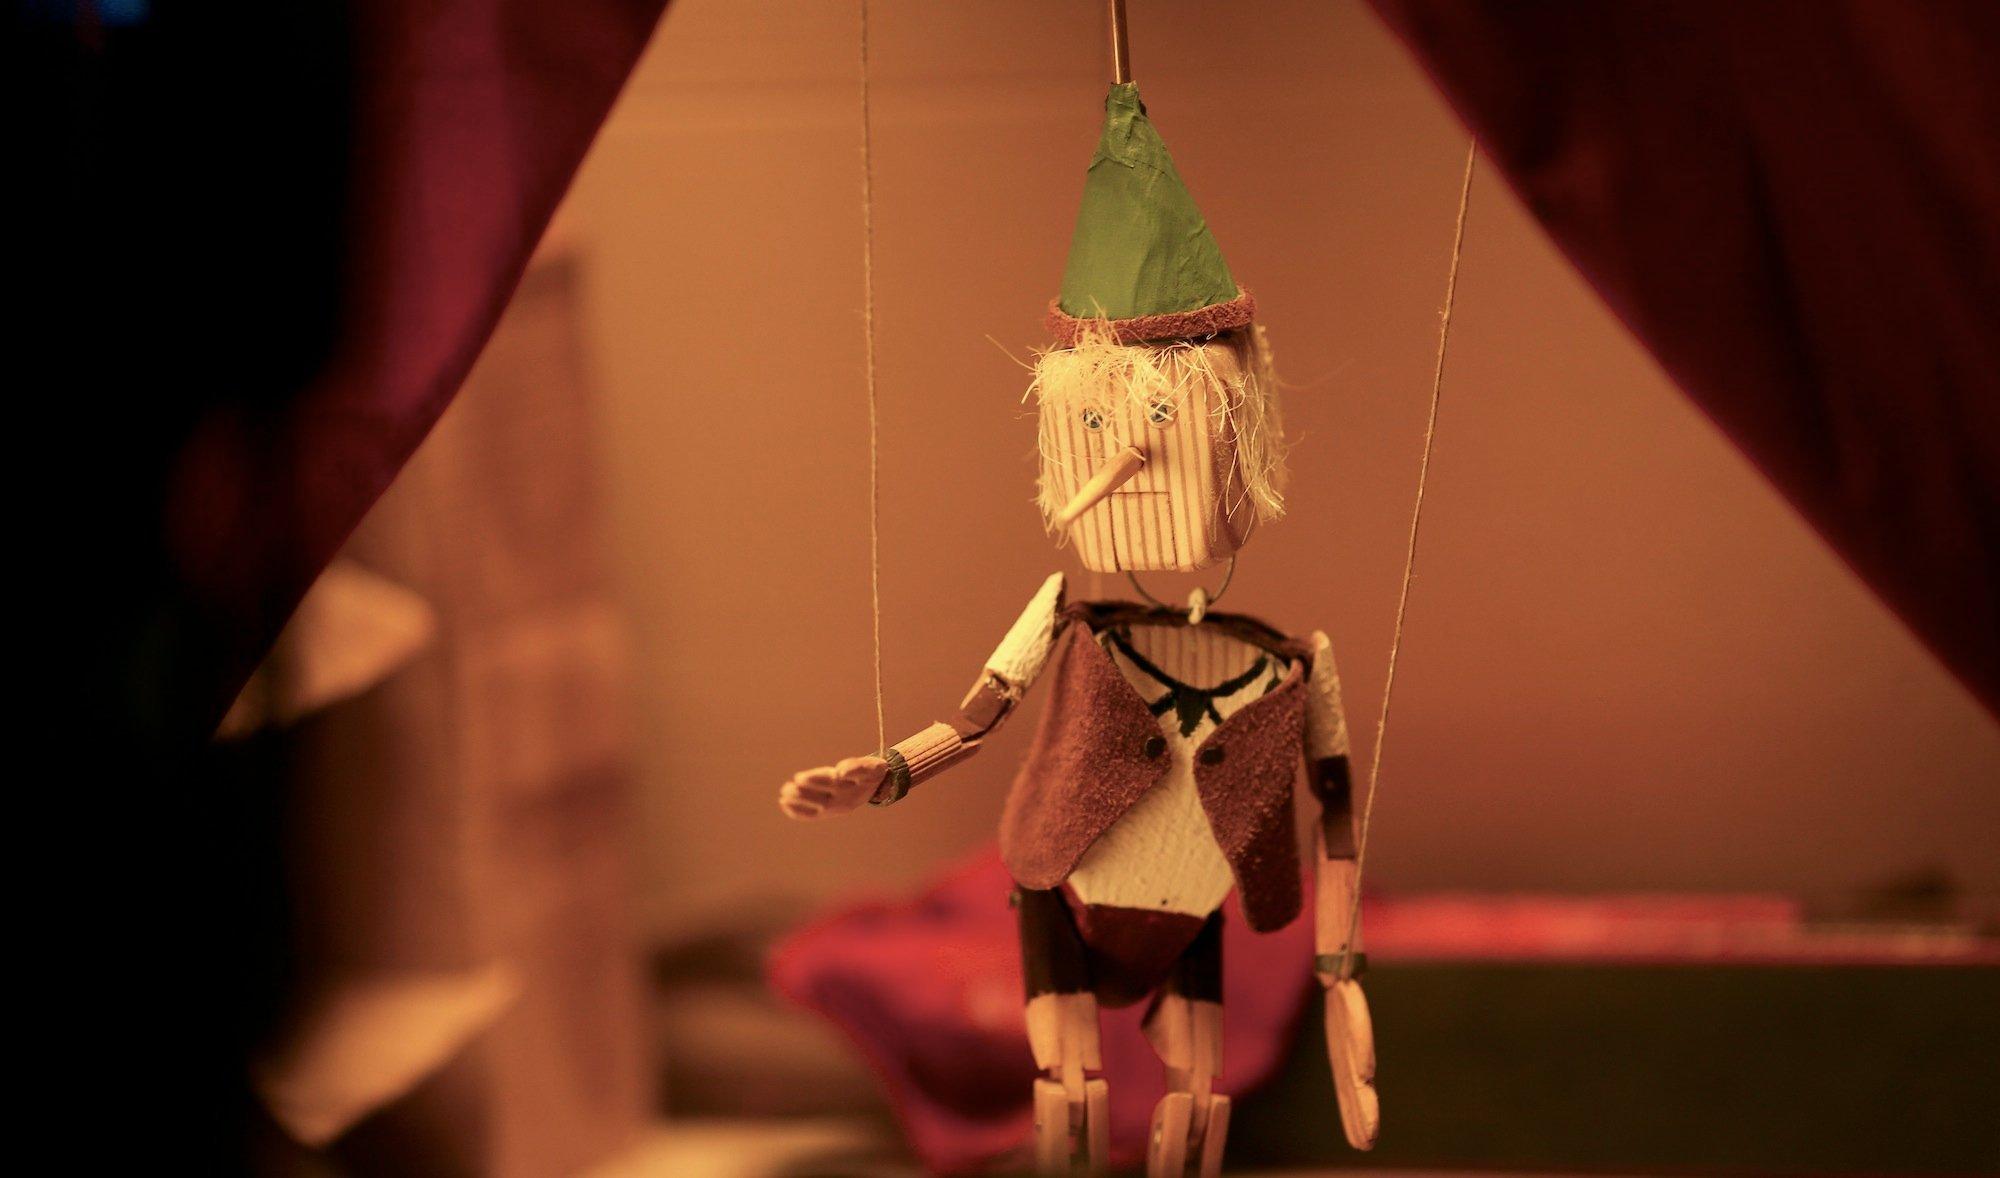 Tournage Extrême Pinocchio 831.jpg